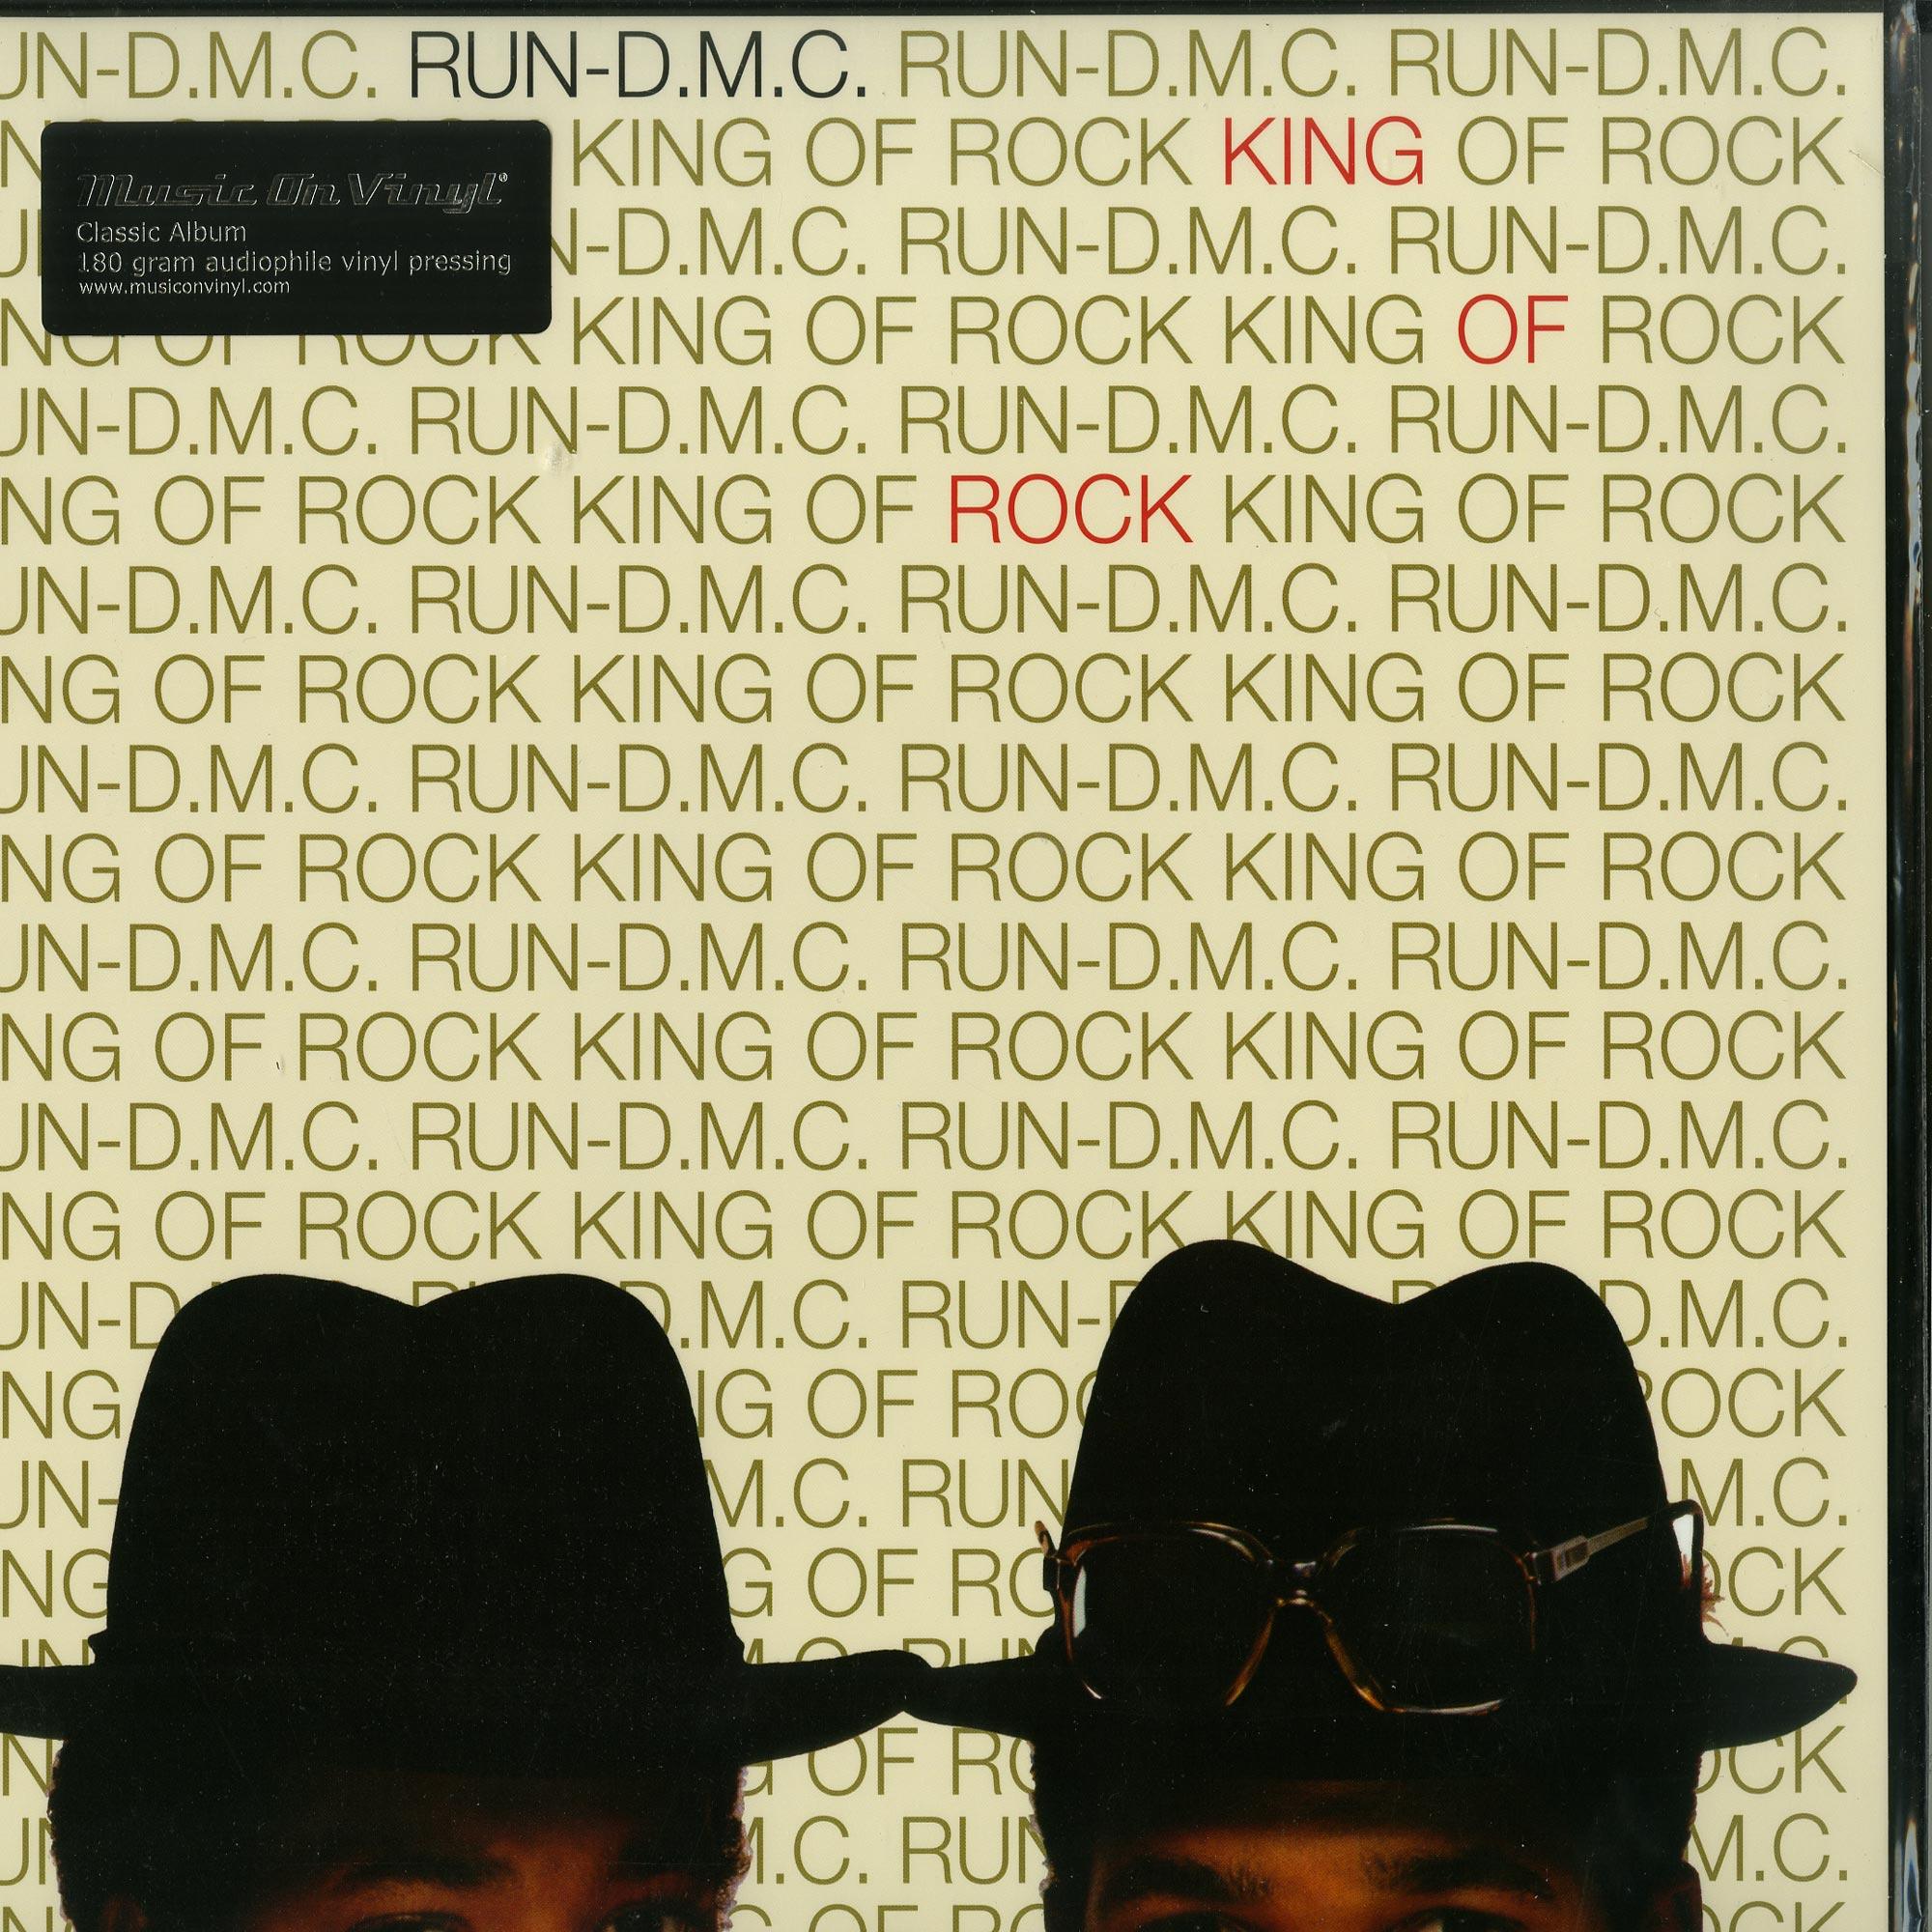 Run-D.M.C. - KING OF ROCK